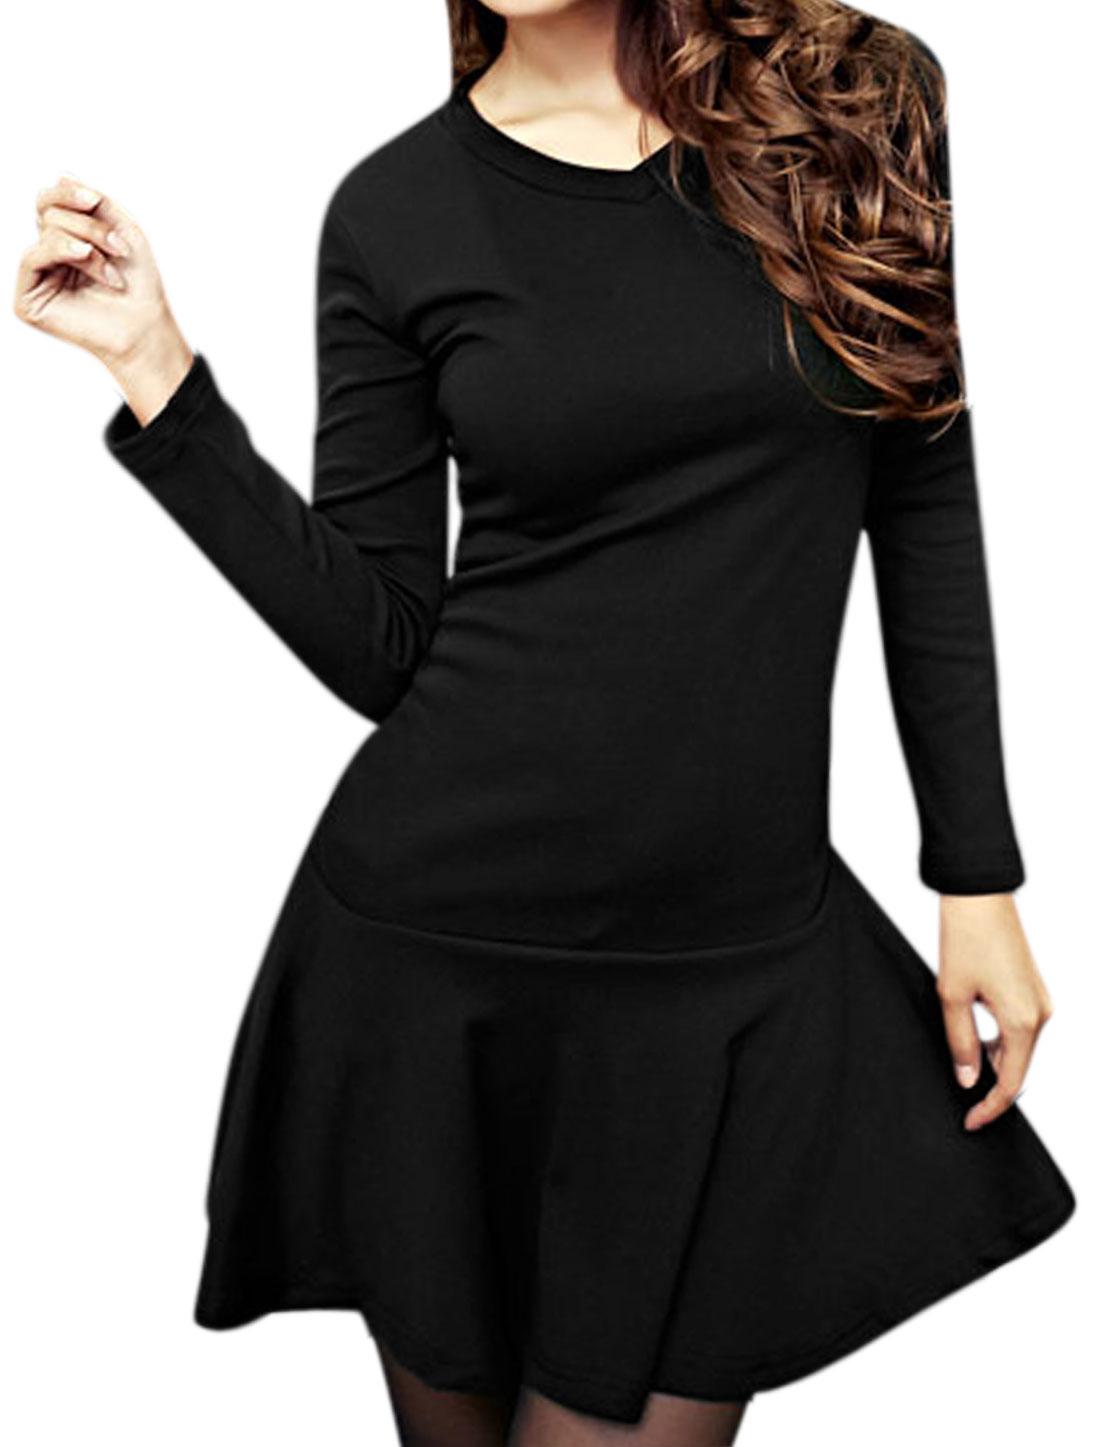 Women V Neck Shirred Flouncing Hem Slim Fit Mini Dress Black S